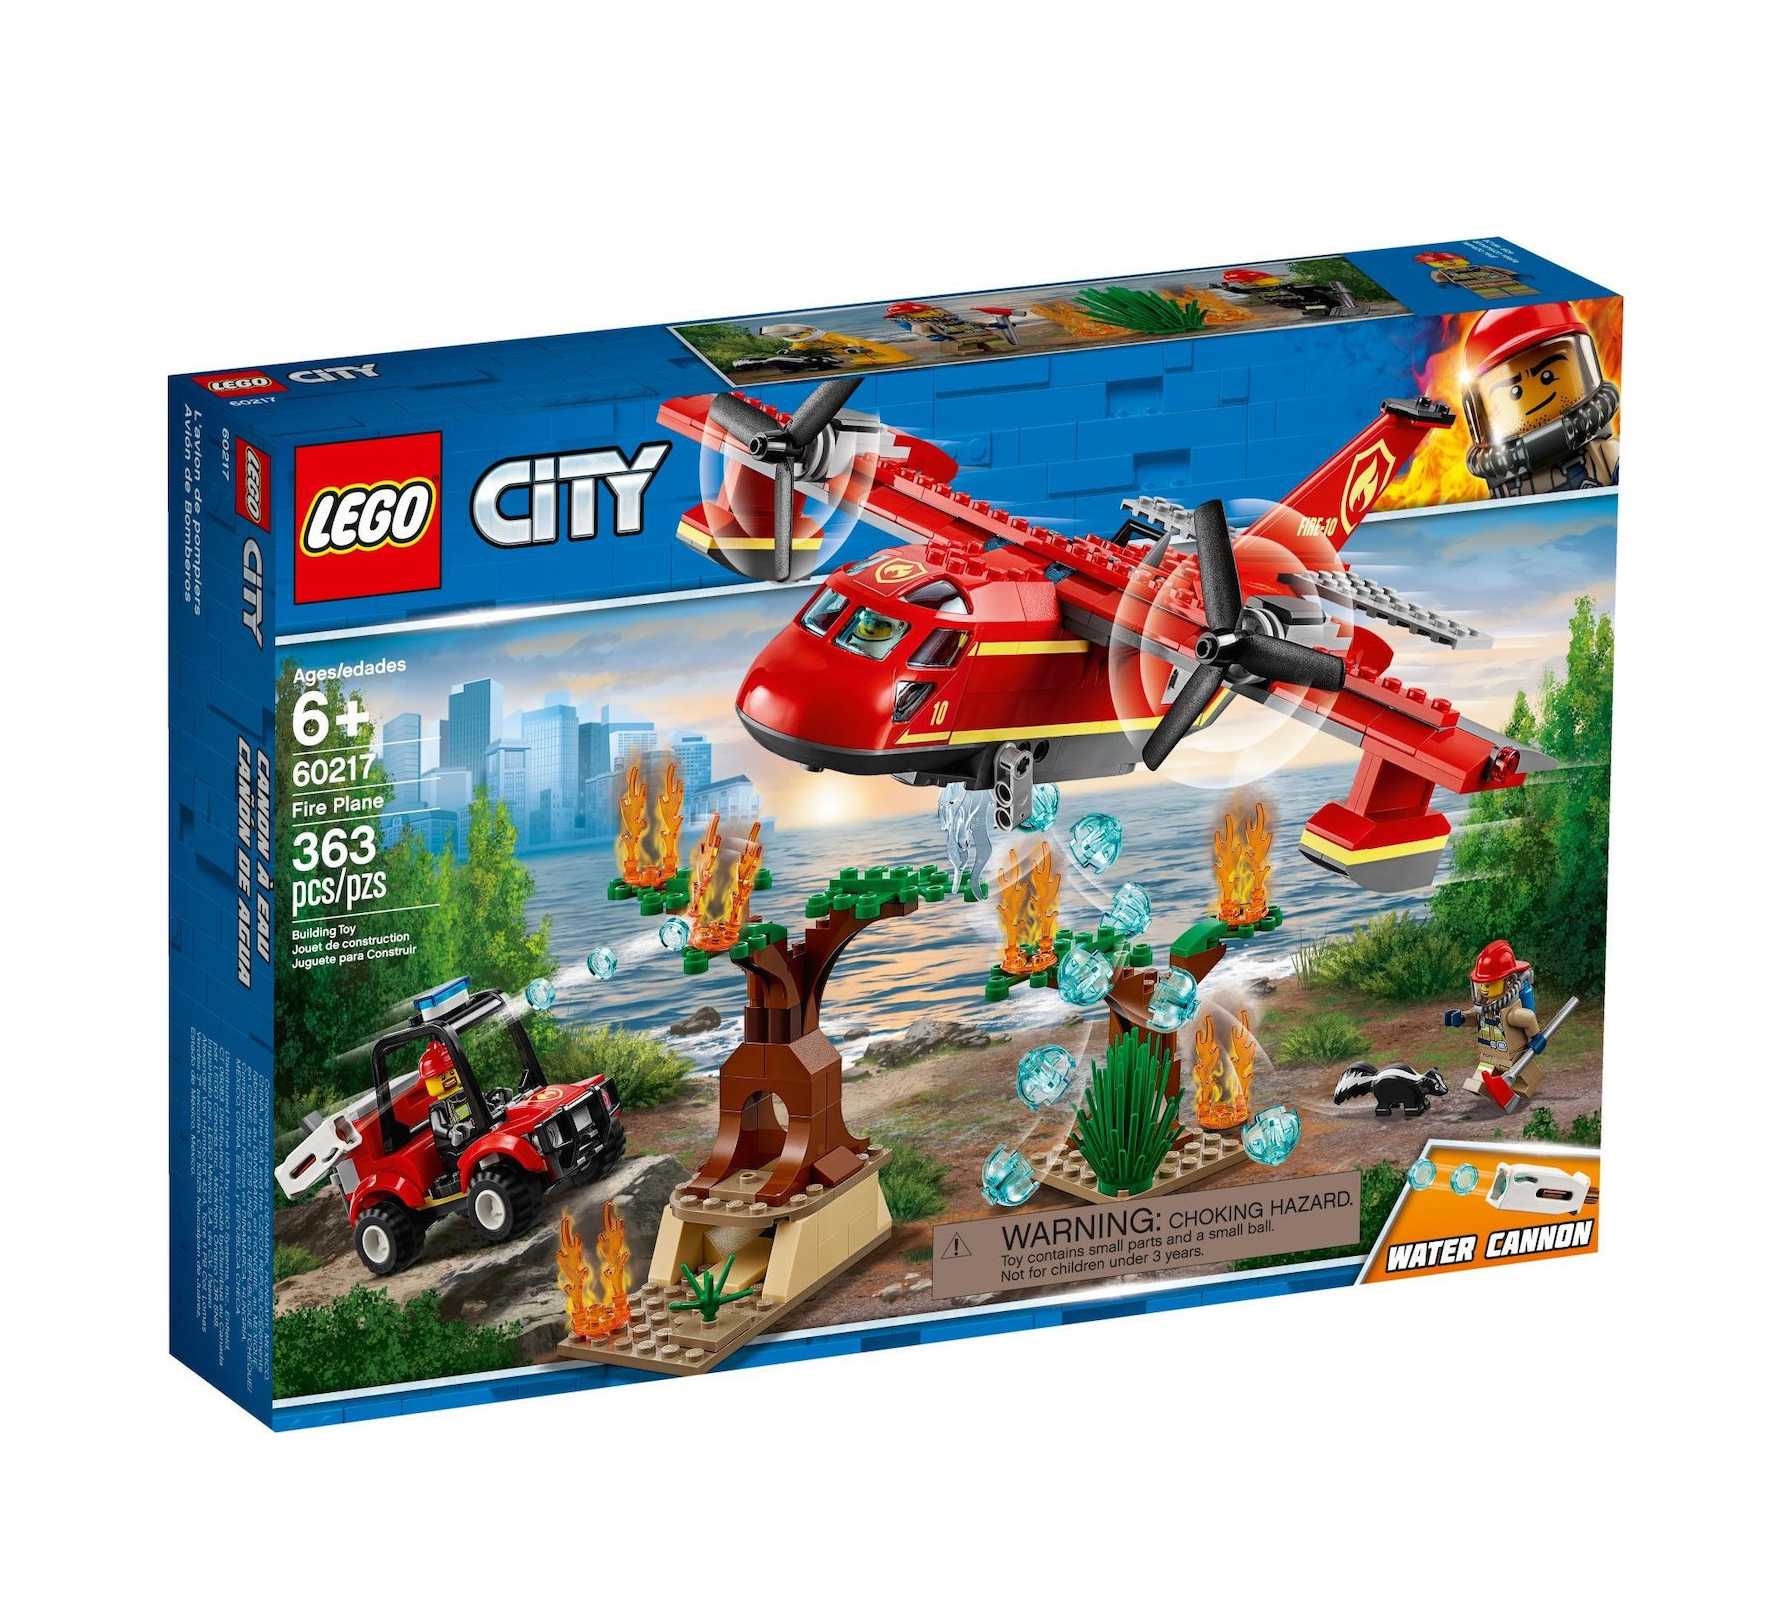 Lego City: Fire Plane 60217